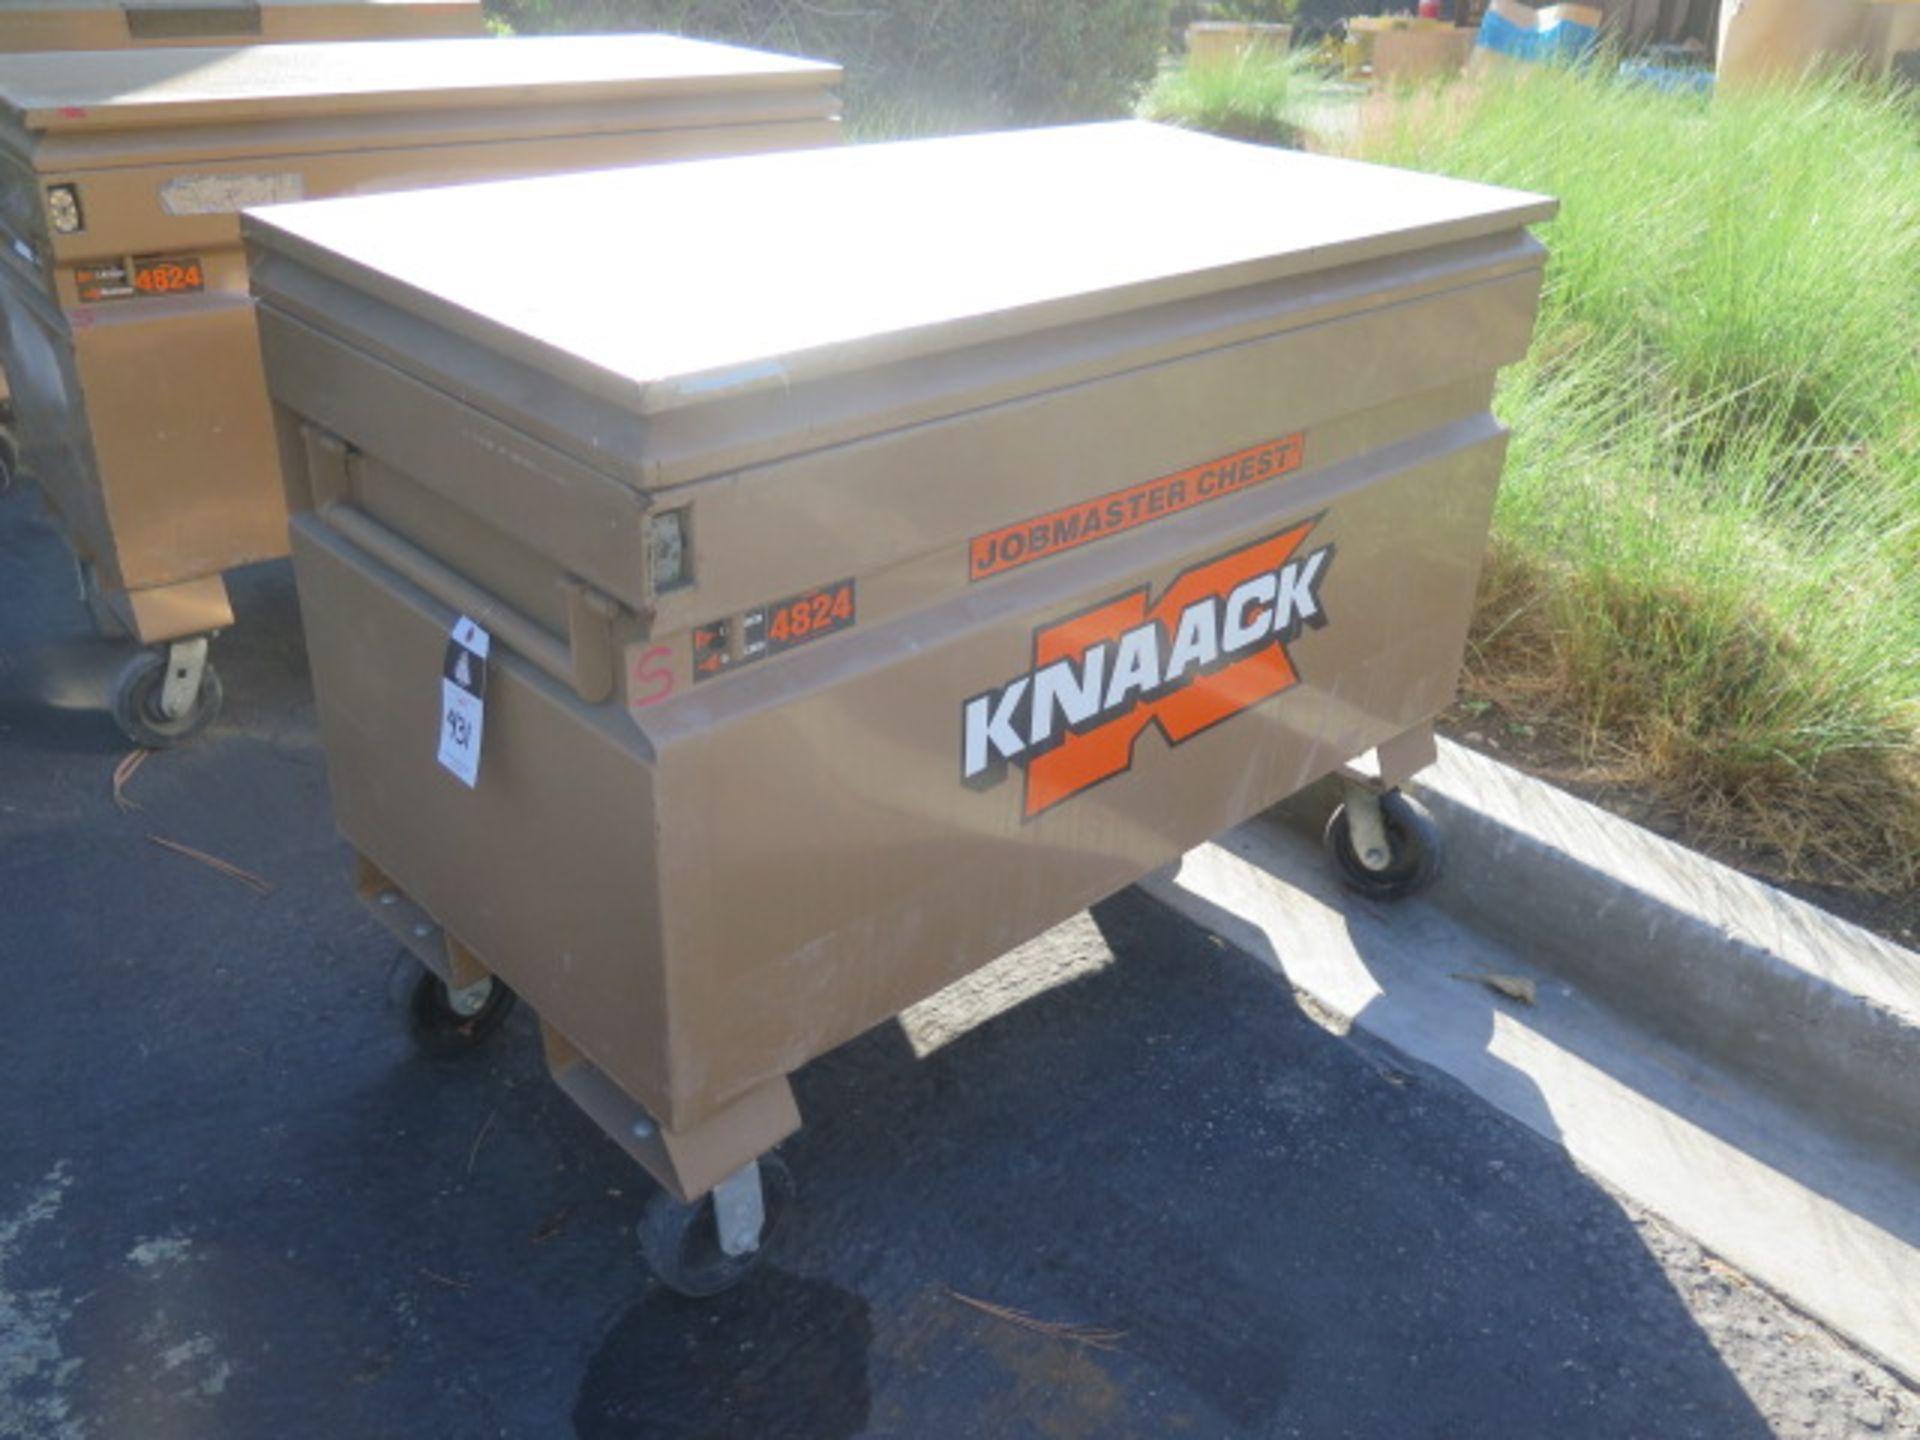 Knaack mdl. 4824 Rolling Job Box (SOLD AS-IS - NO WARRANTY) - Image 2 of 3